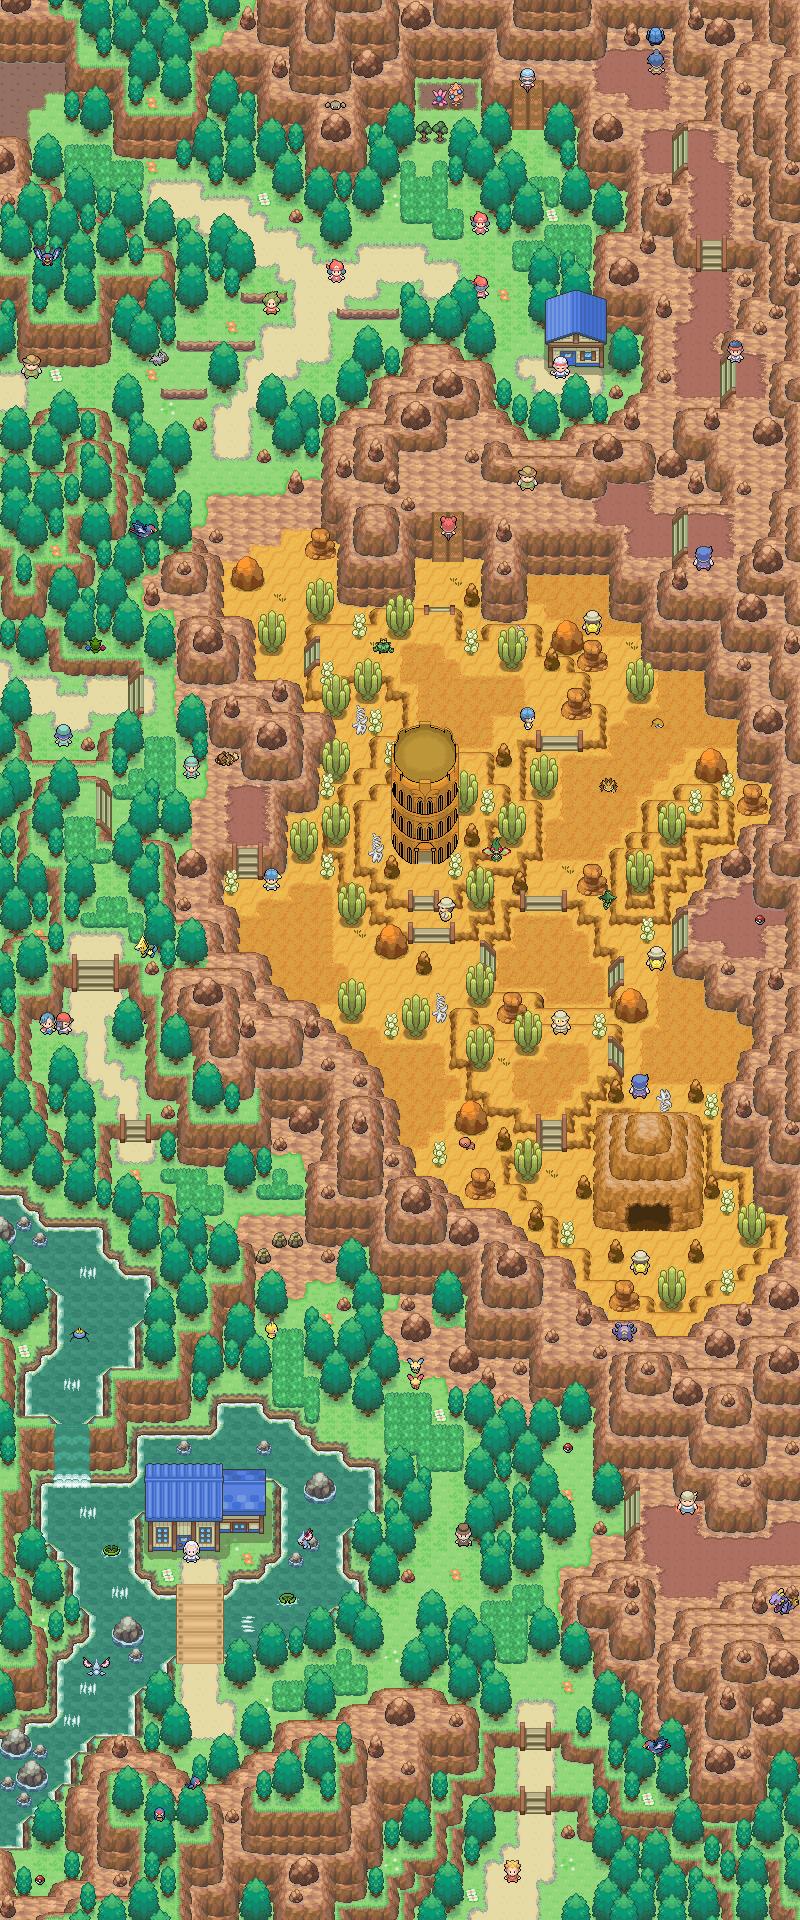 Pokémon-Map: Remake Route 111